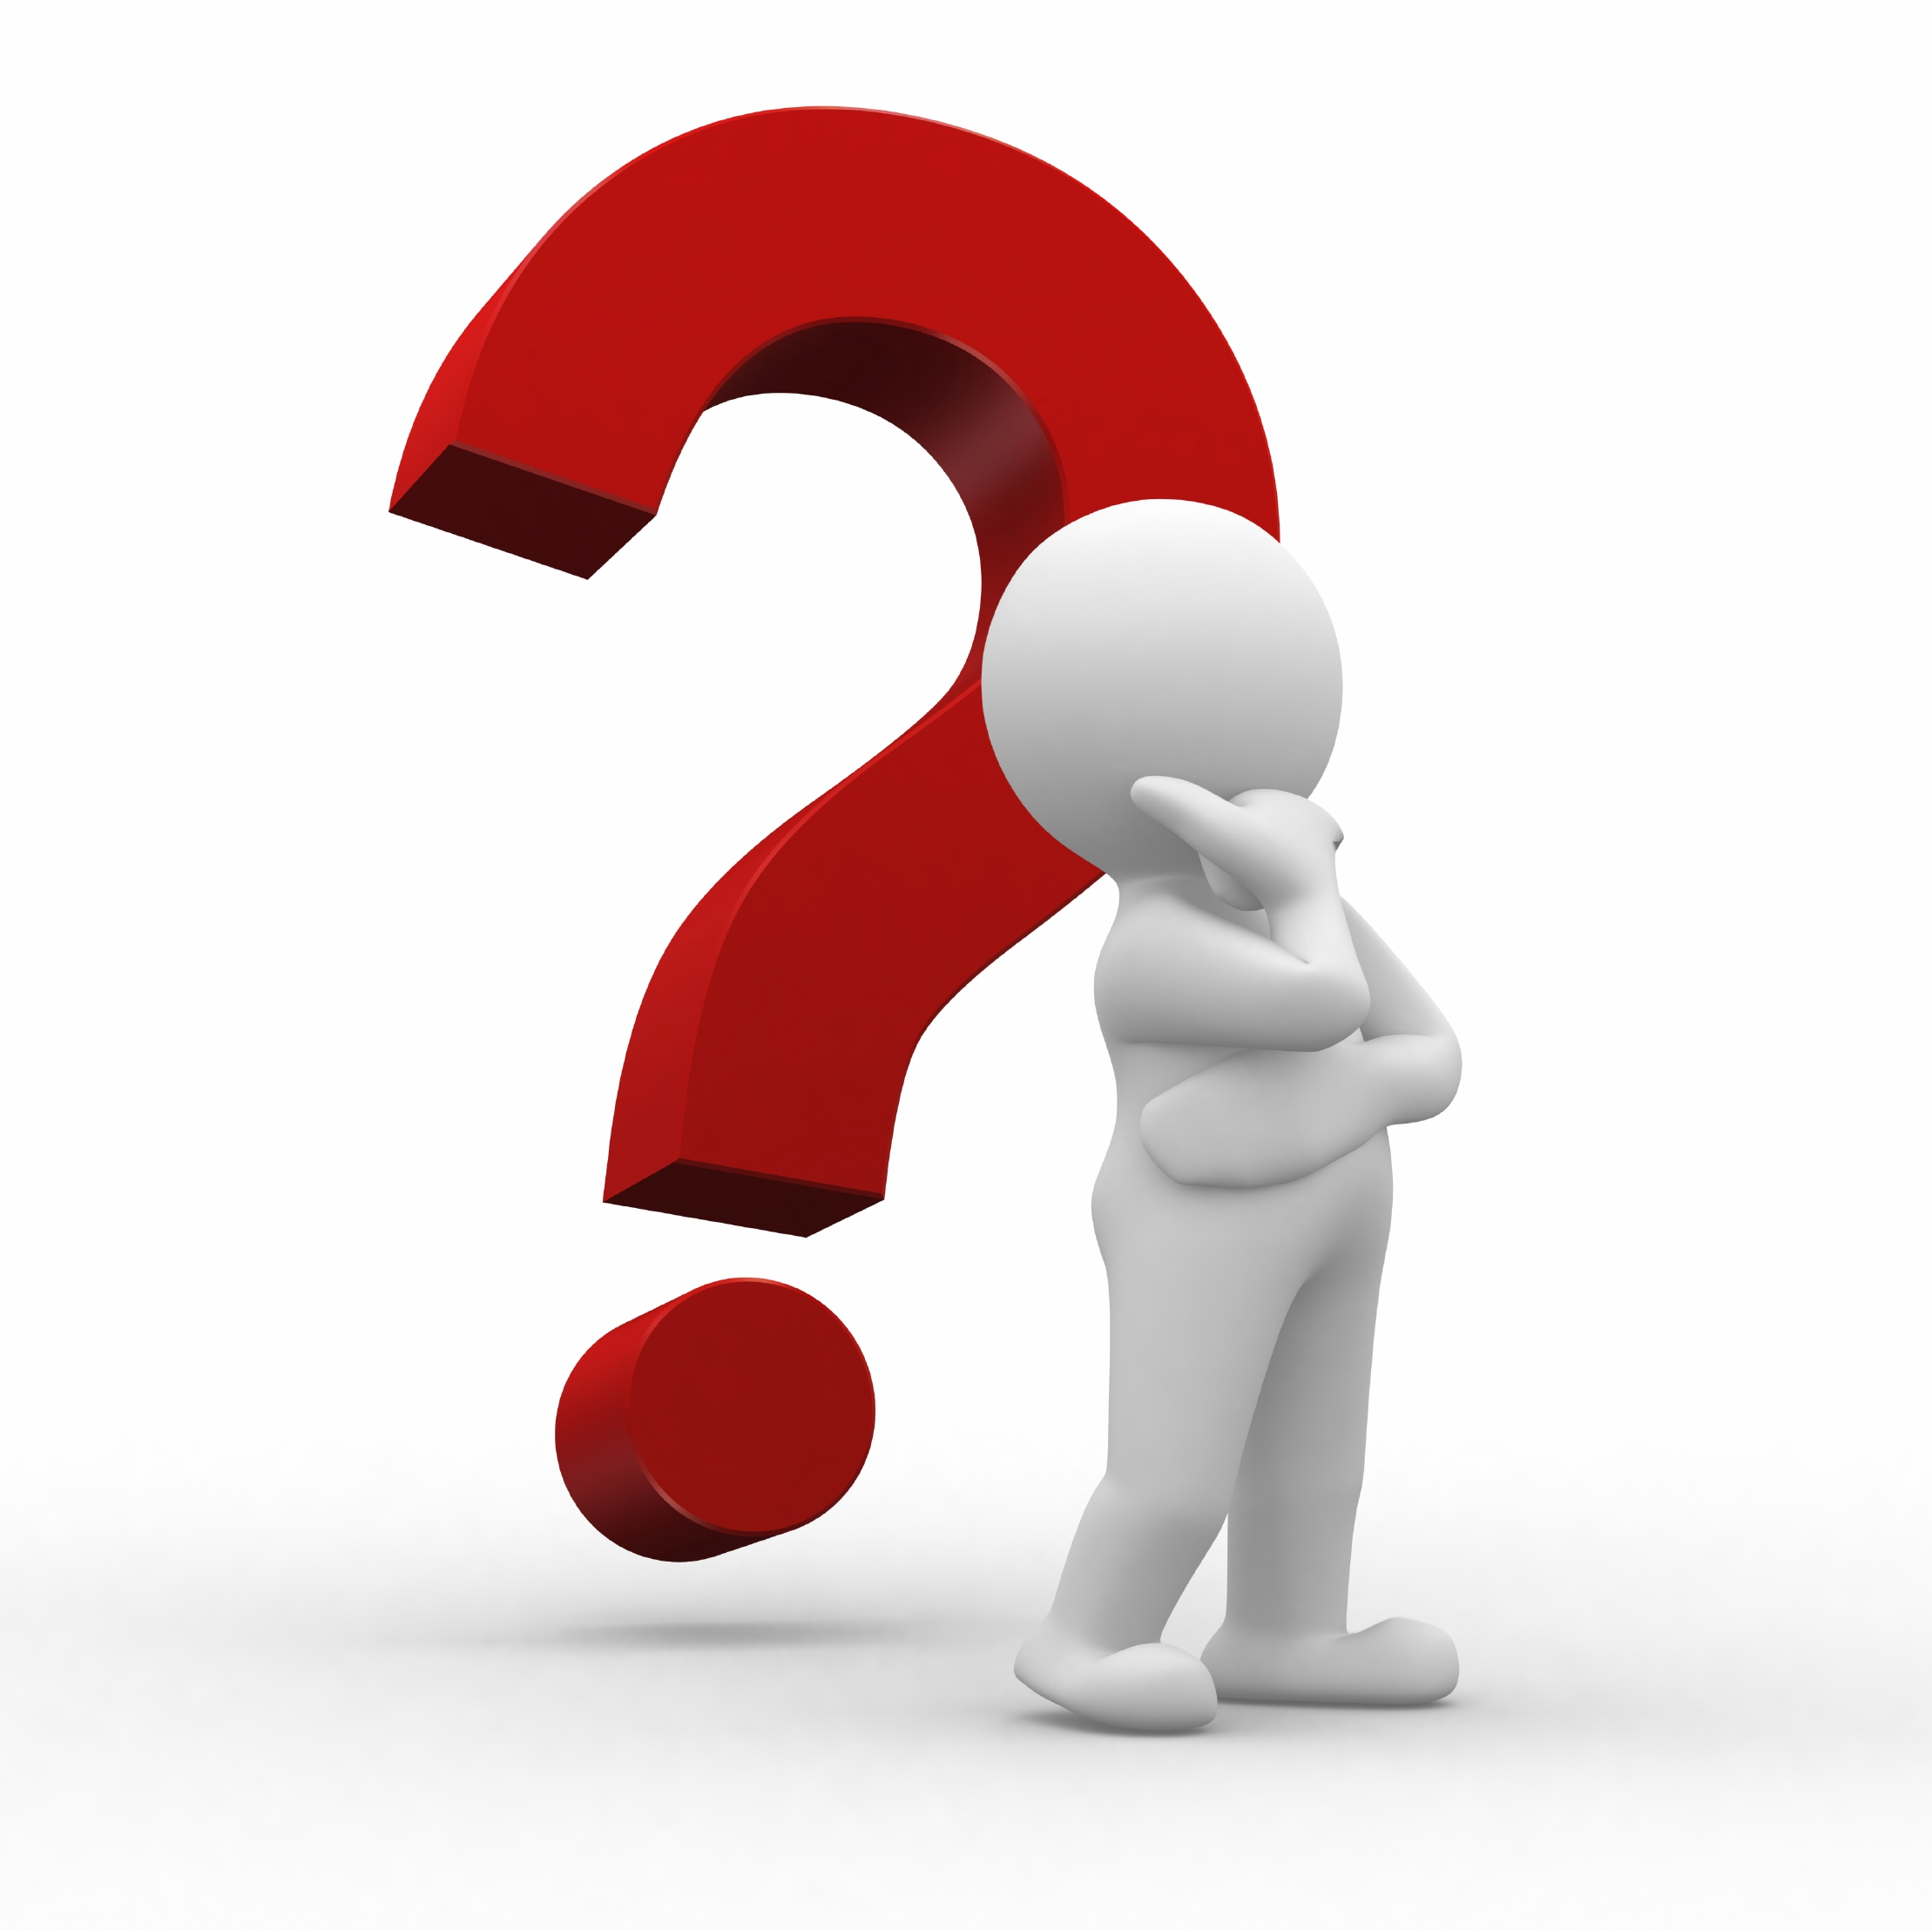 Clipart Question Mark 3d